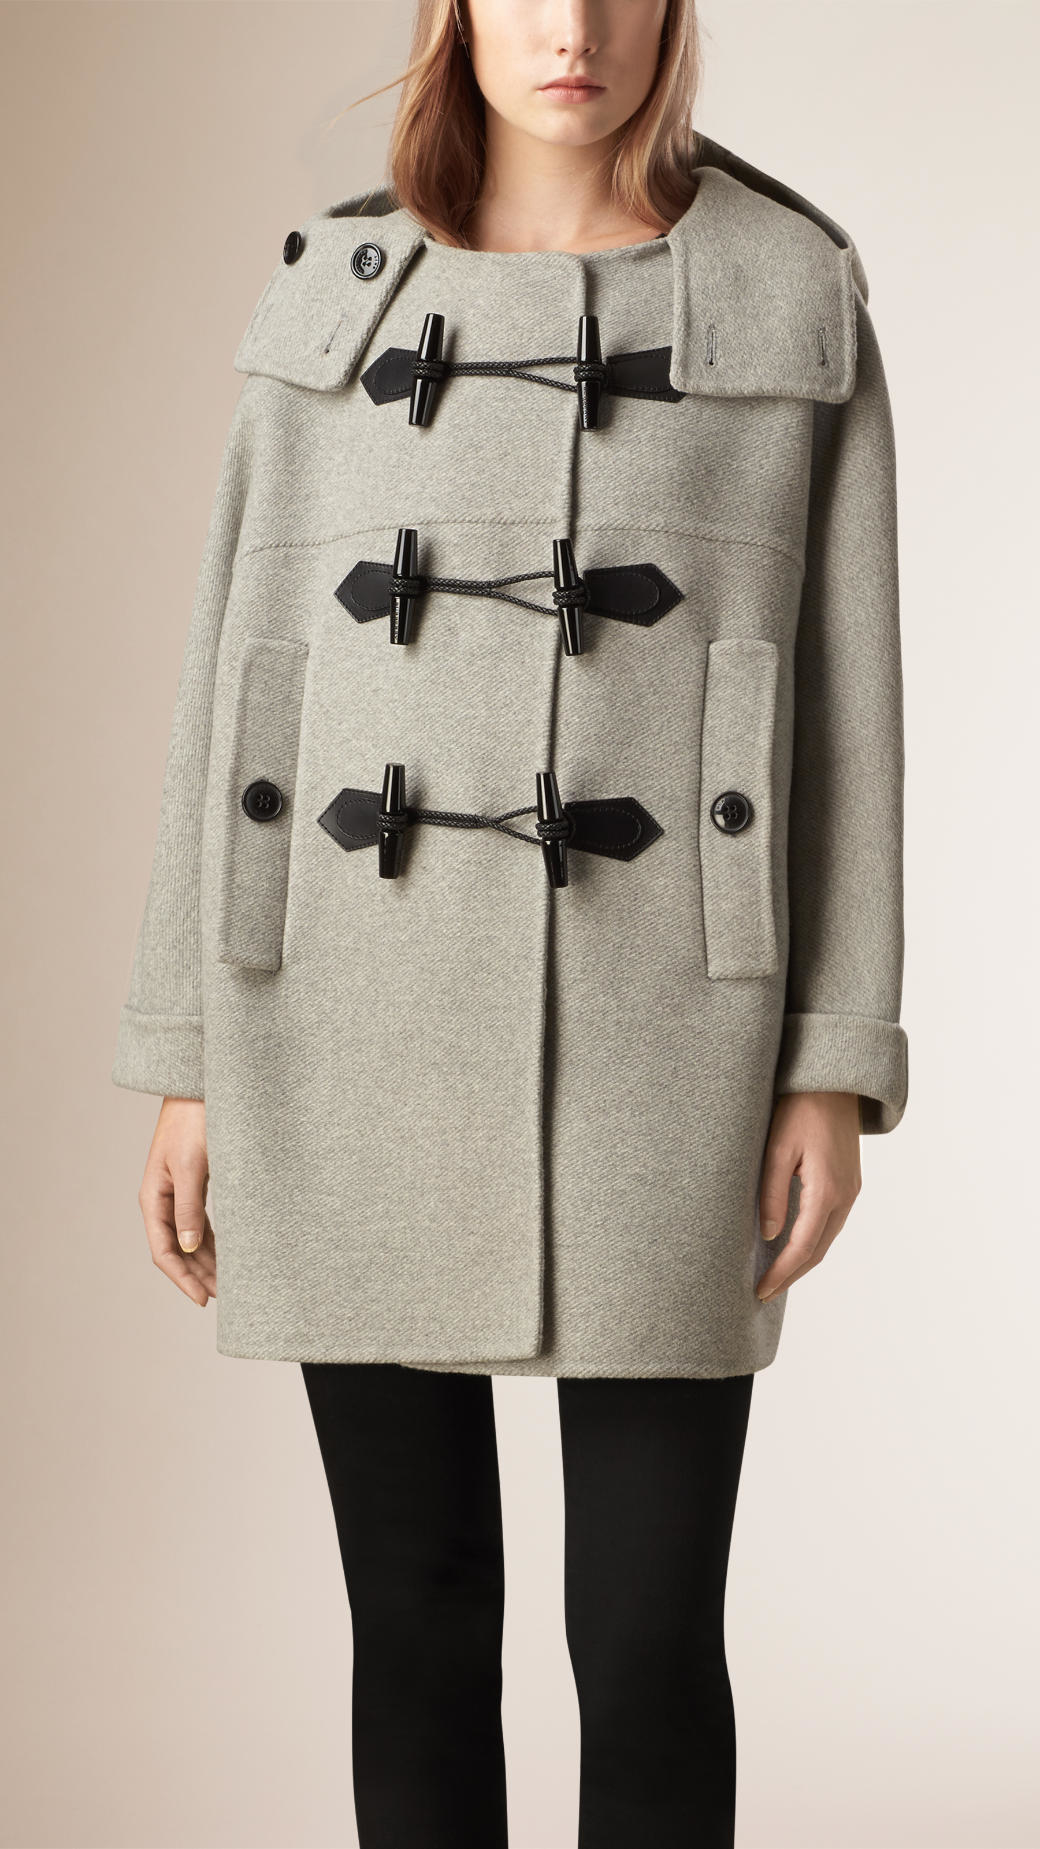 Burberry Oversize Virgin Wool Cashmere Duffle Coat Light Grey